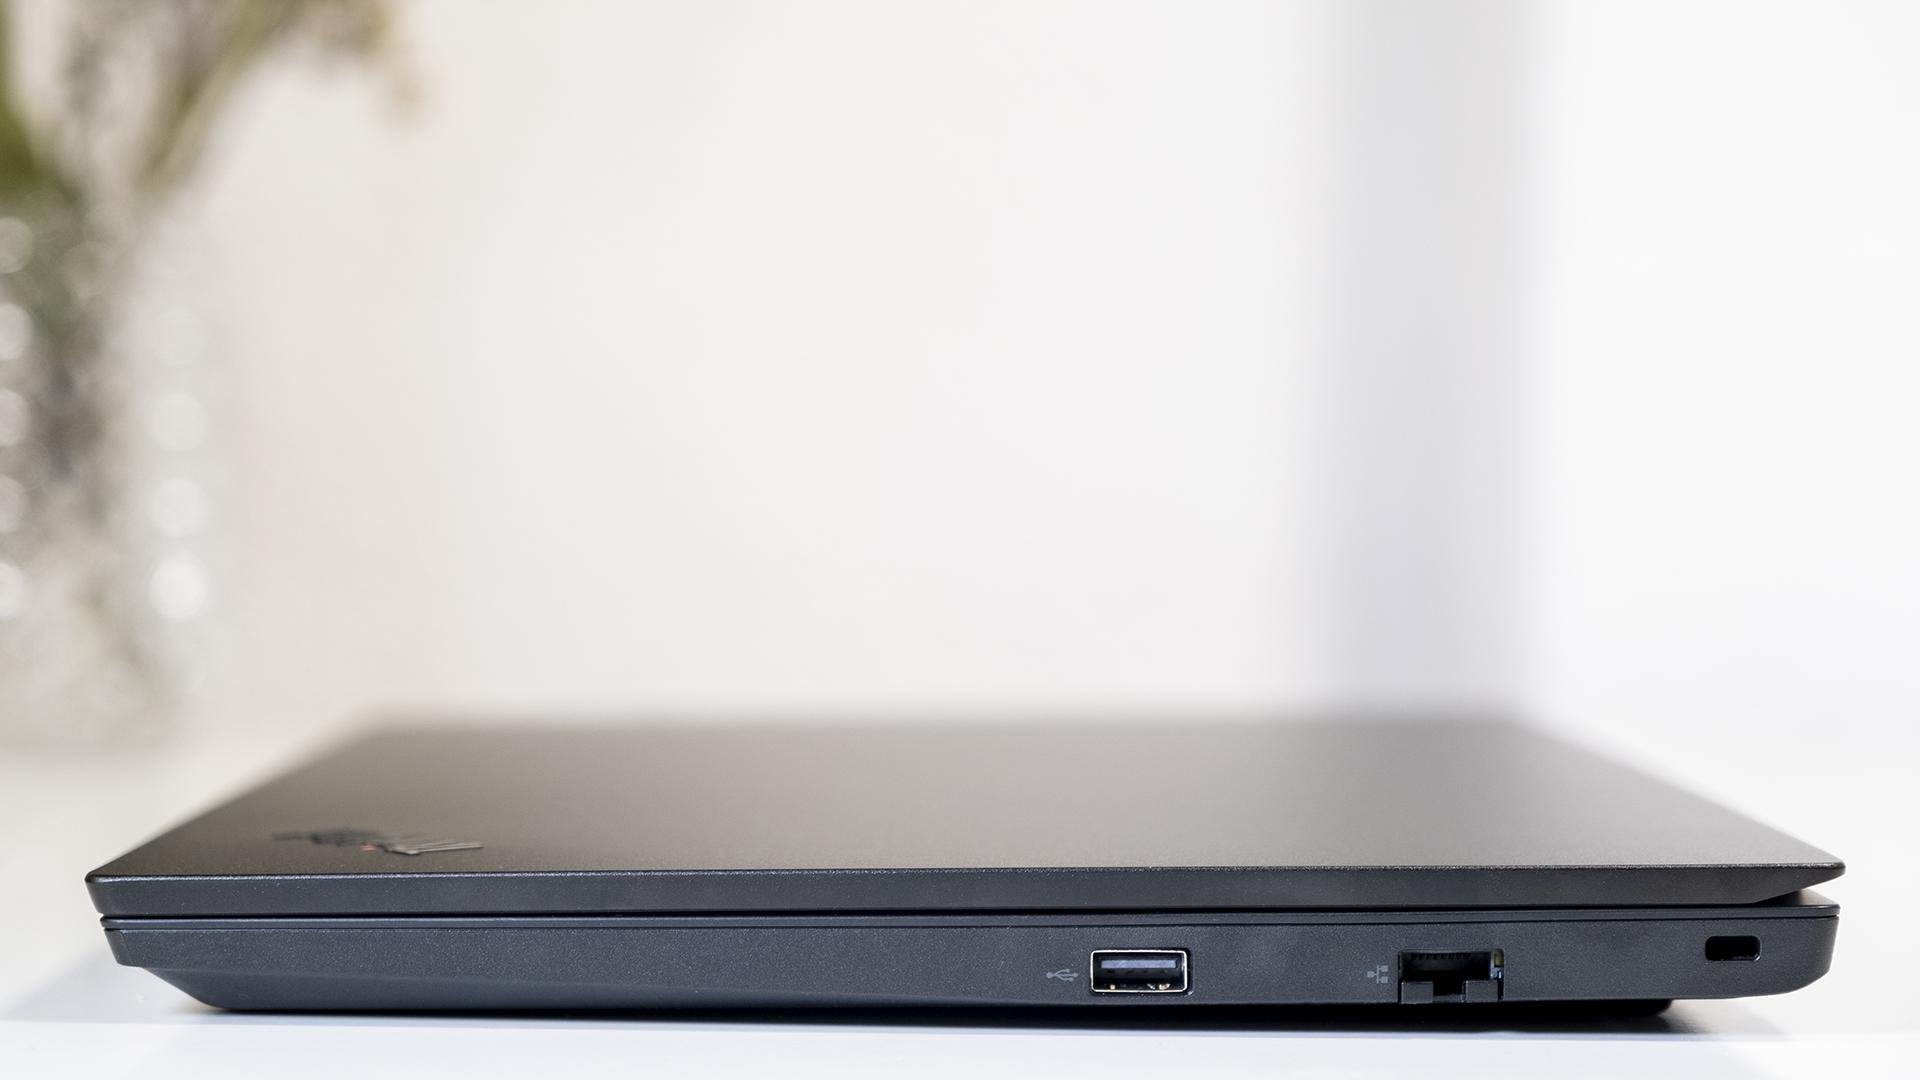 Lenovo ThinkPad E15 Anschlüsse Rechts